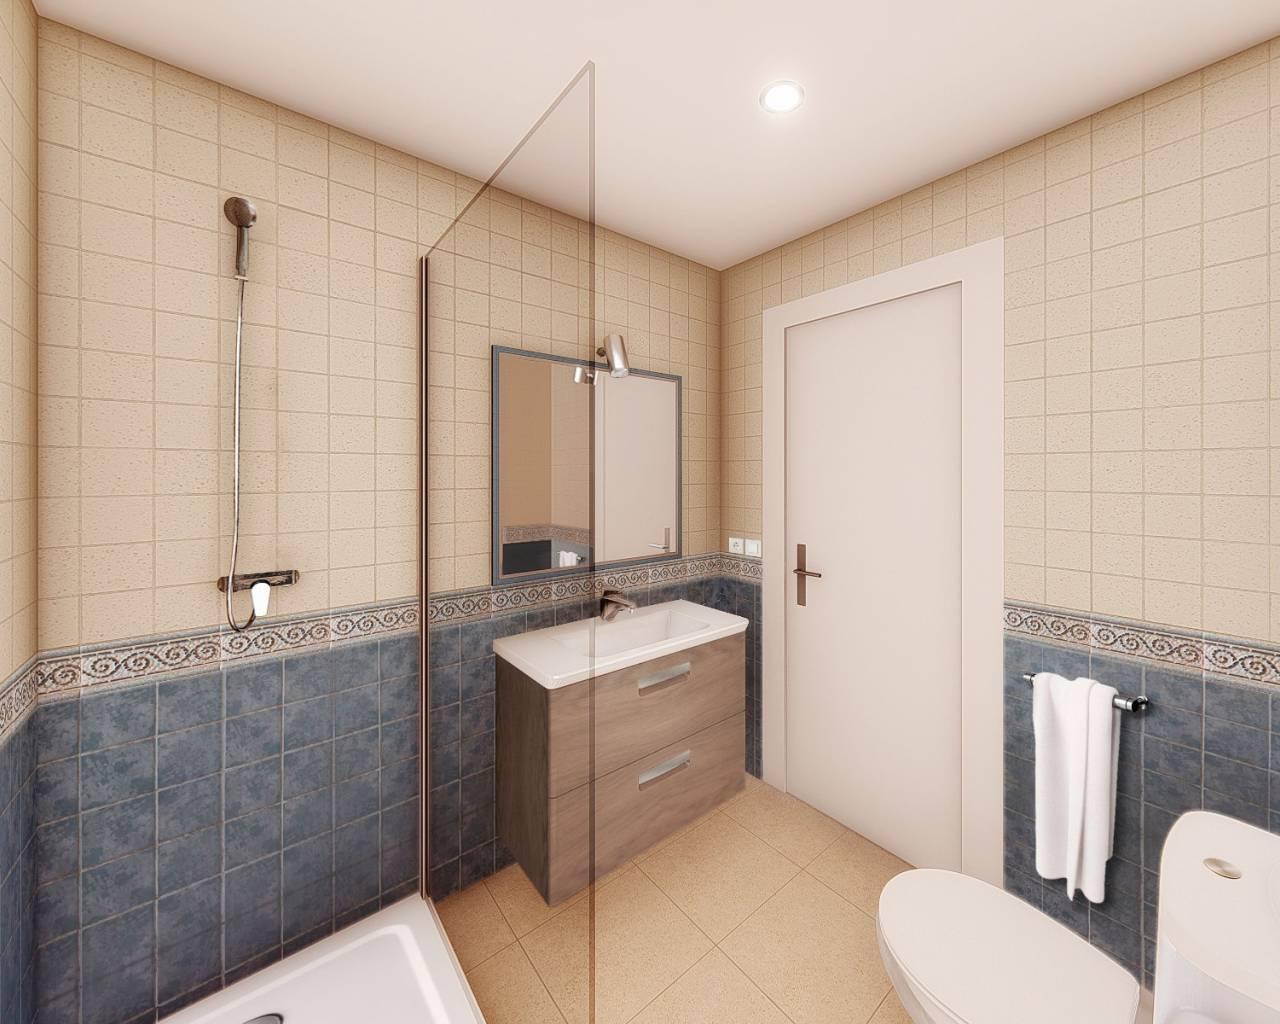 nieuwbouw-geschakelde-woning-duplex-torre-pacheco-santa-rosalia_4596_xl